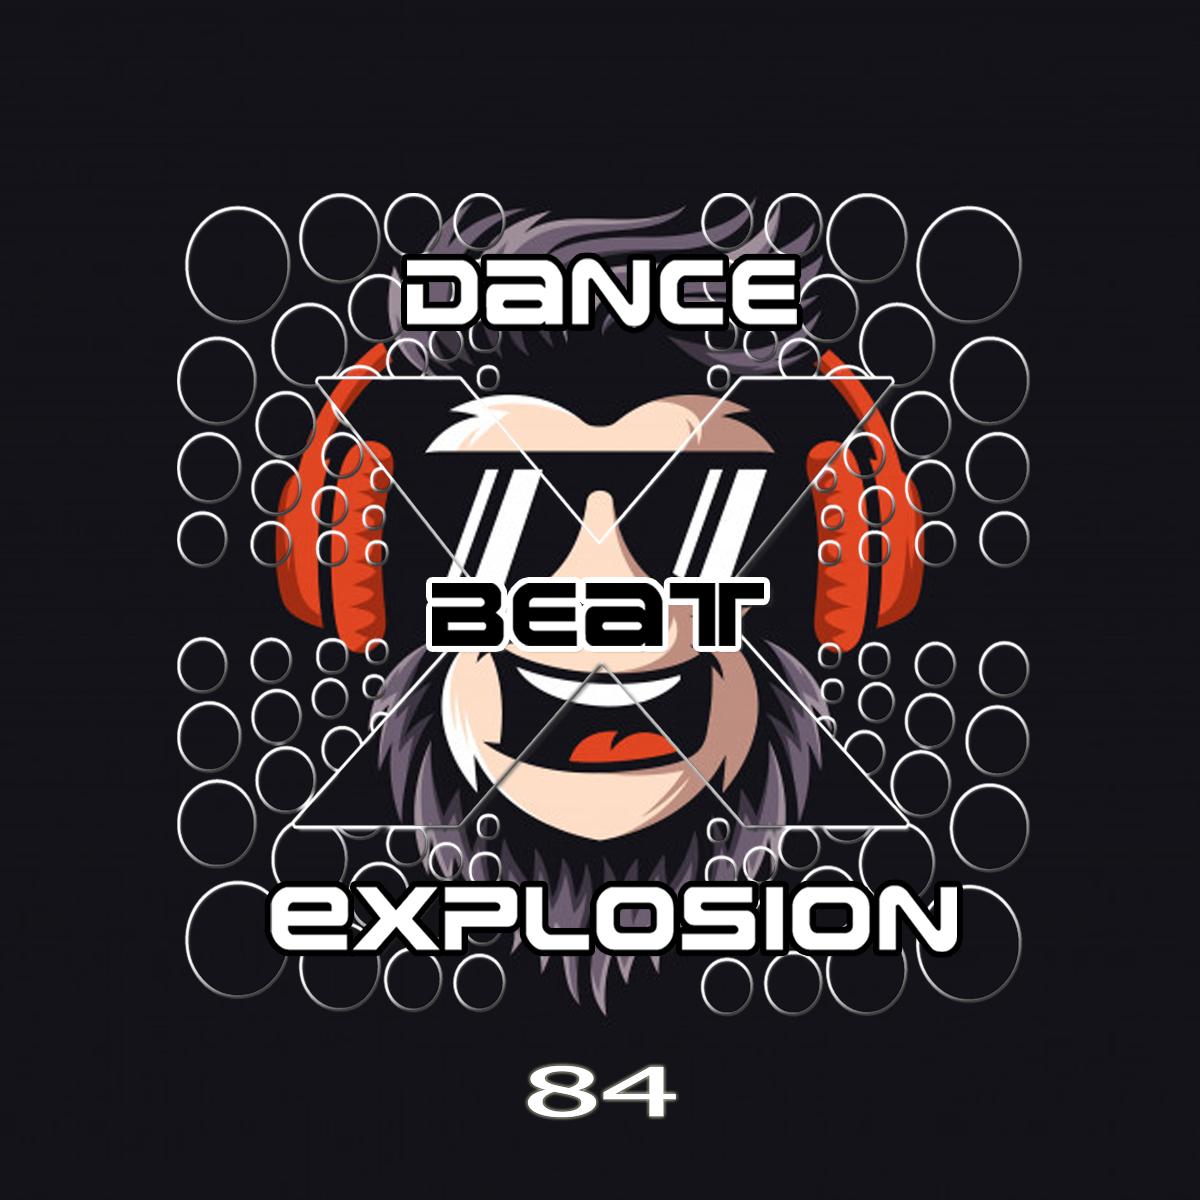 Dance Beat Explosion 84